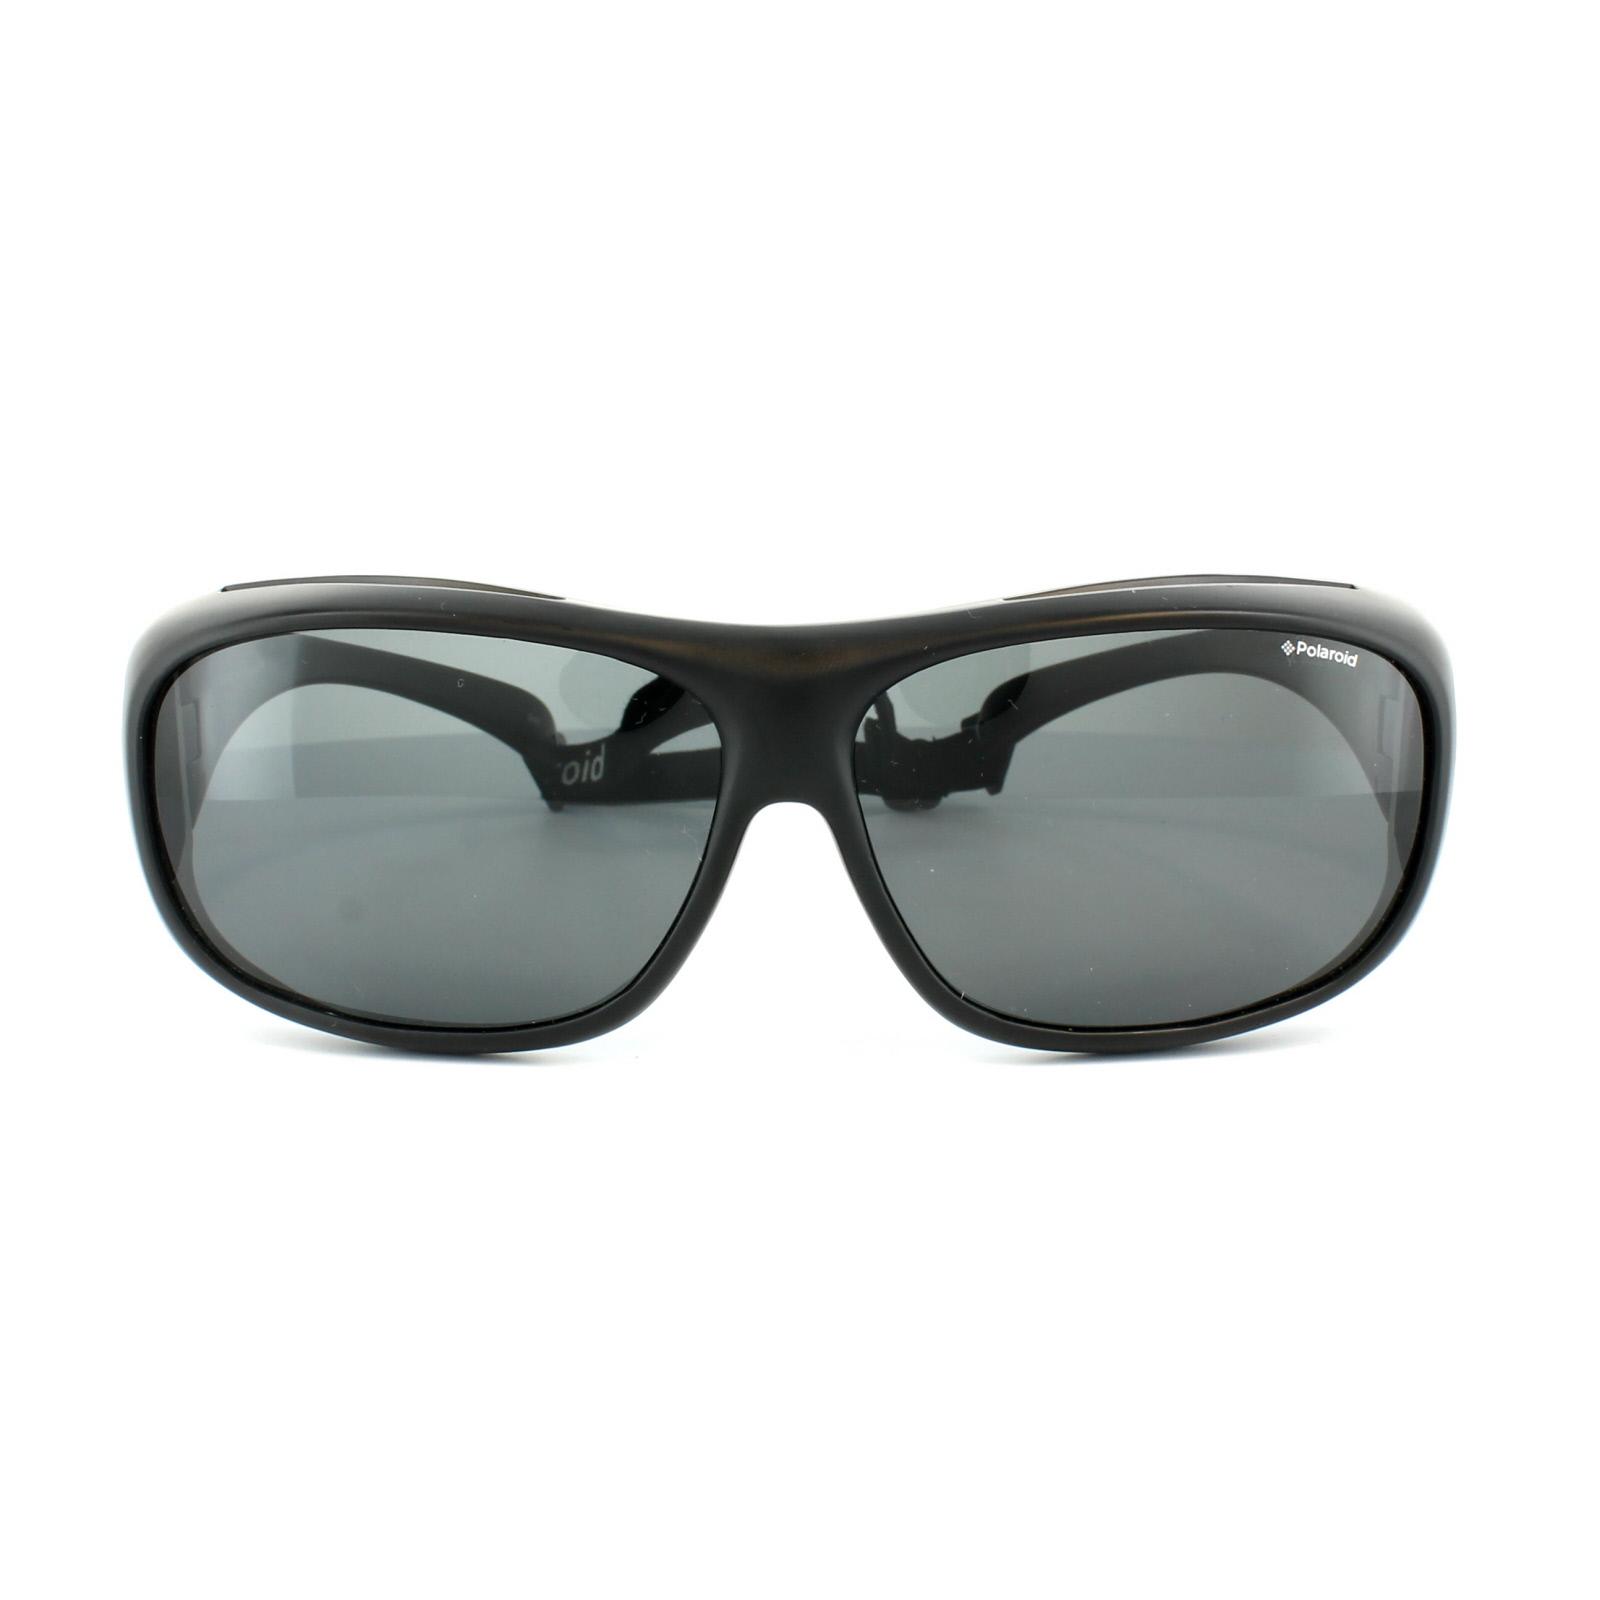 Cheap Polaroid Suncovers Fitover Sunglasses 08535 KIH Y2 ...